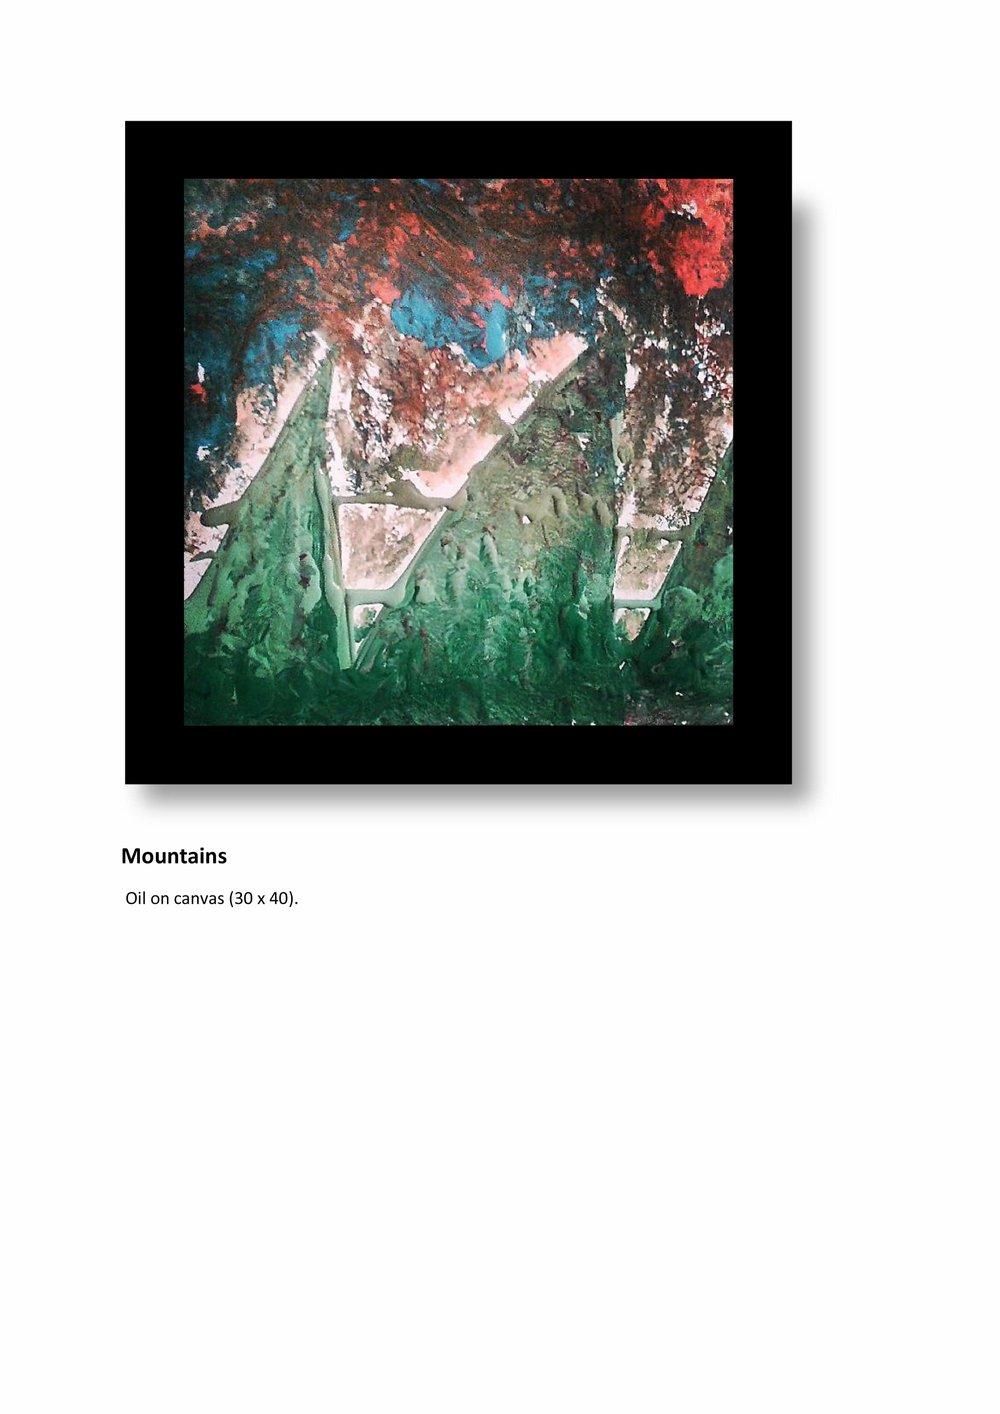 art-portfolio-aglae-corrected-18-min.jpg